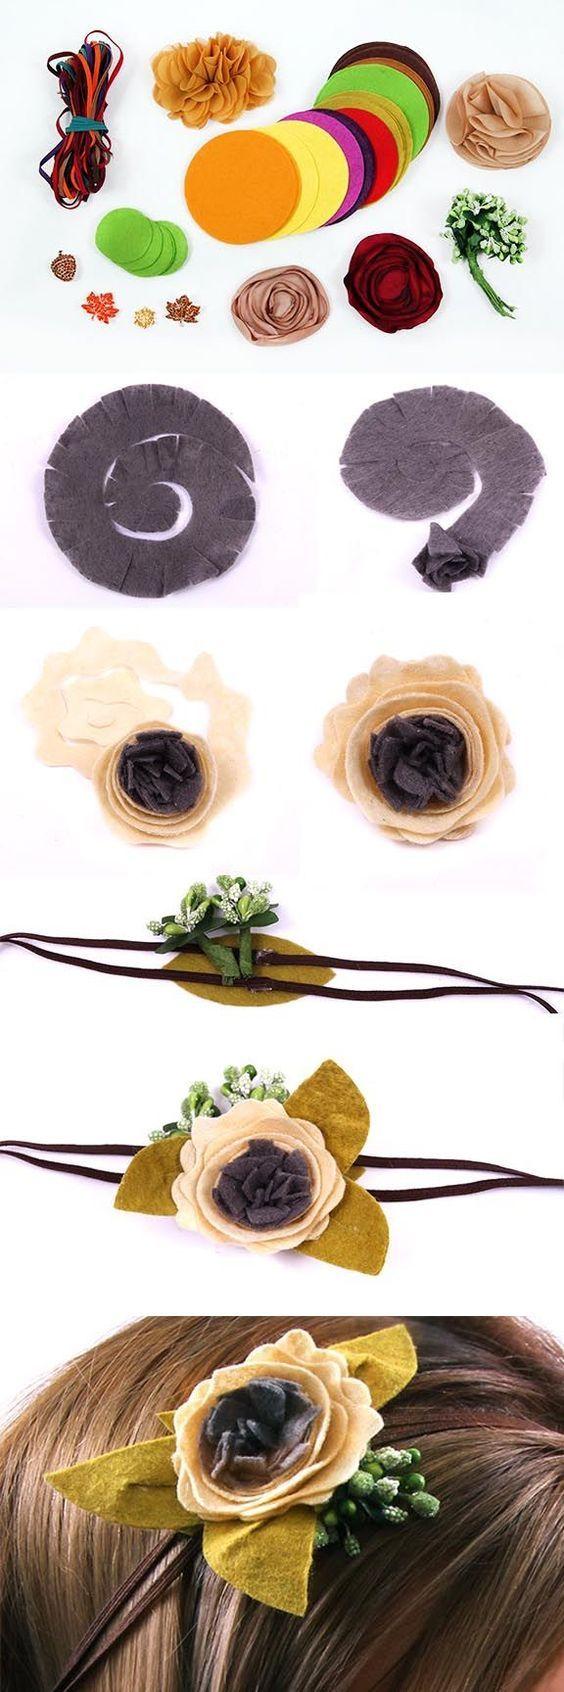 Baby flower headbands diy baby headband ideas learn how to make a baby flower headbands diy baby headband ideas learn how to make a beautiful and ethereal flower headband perfect for newborn or baby photos izmirmasajfo Gallery